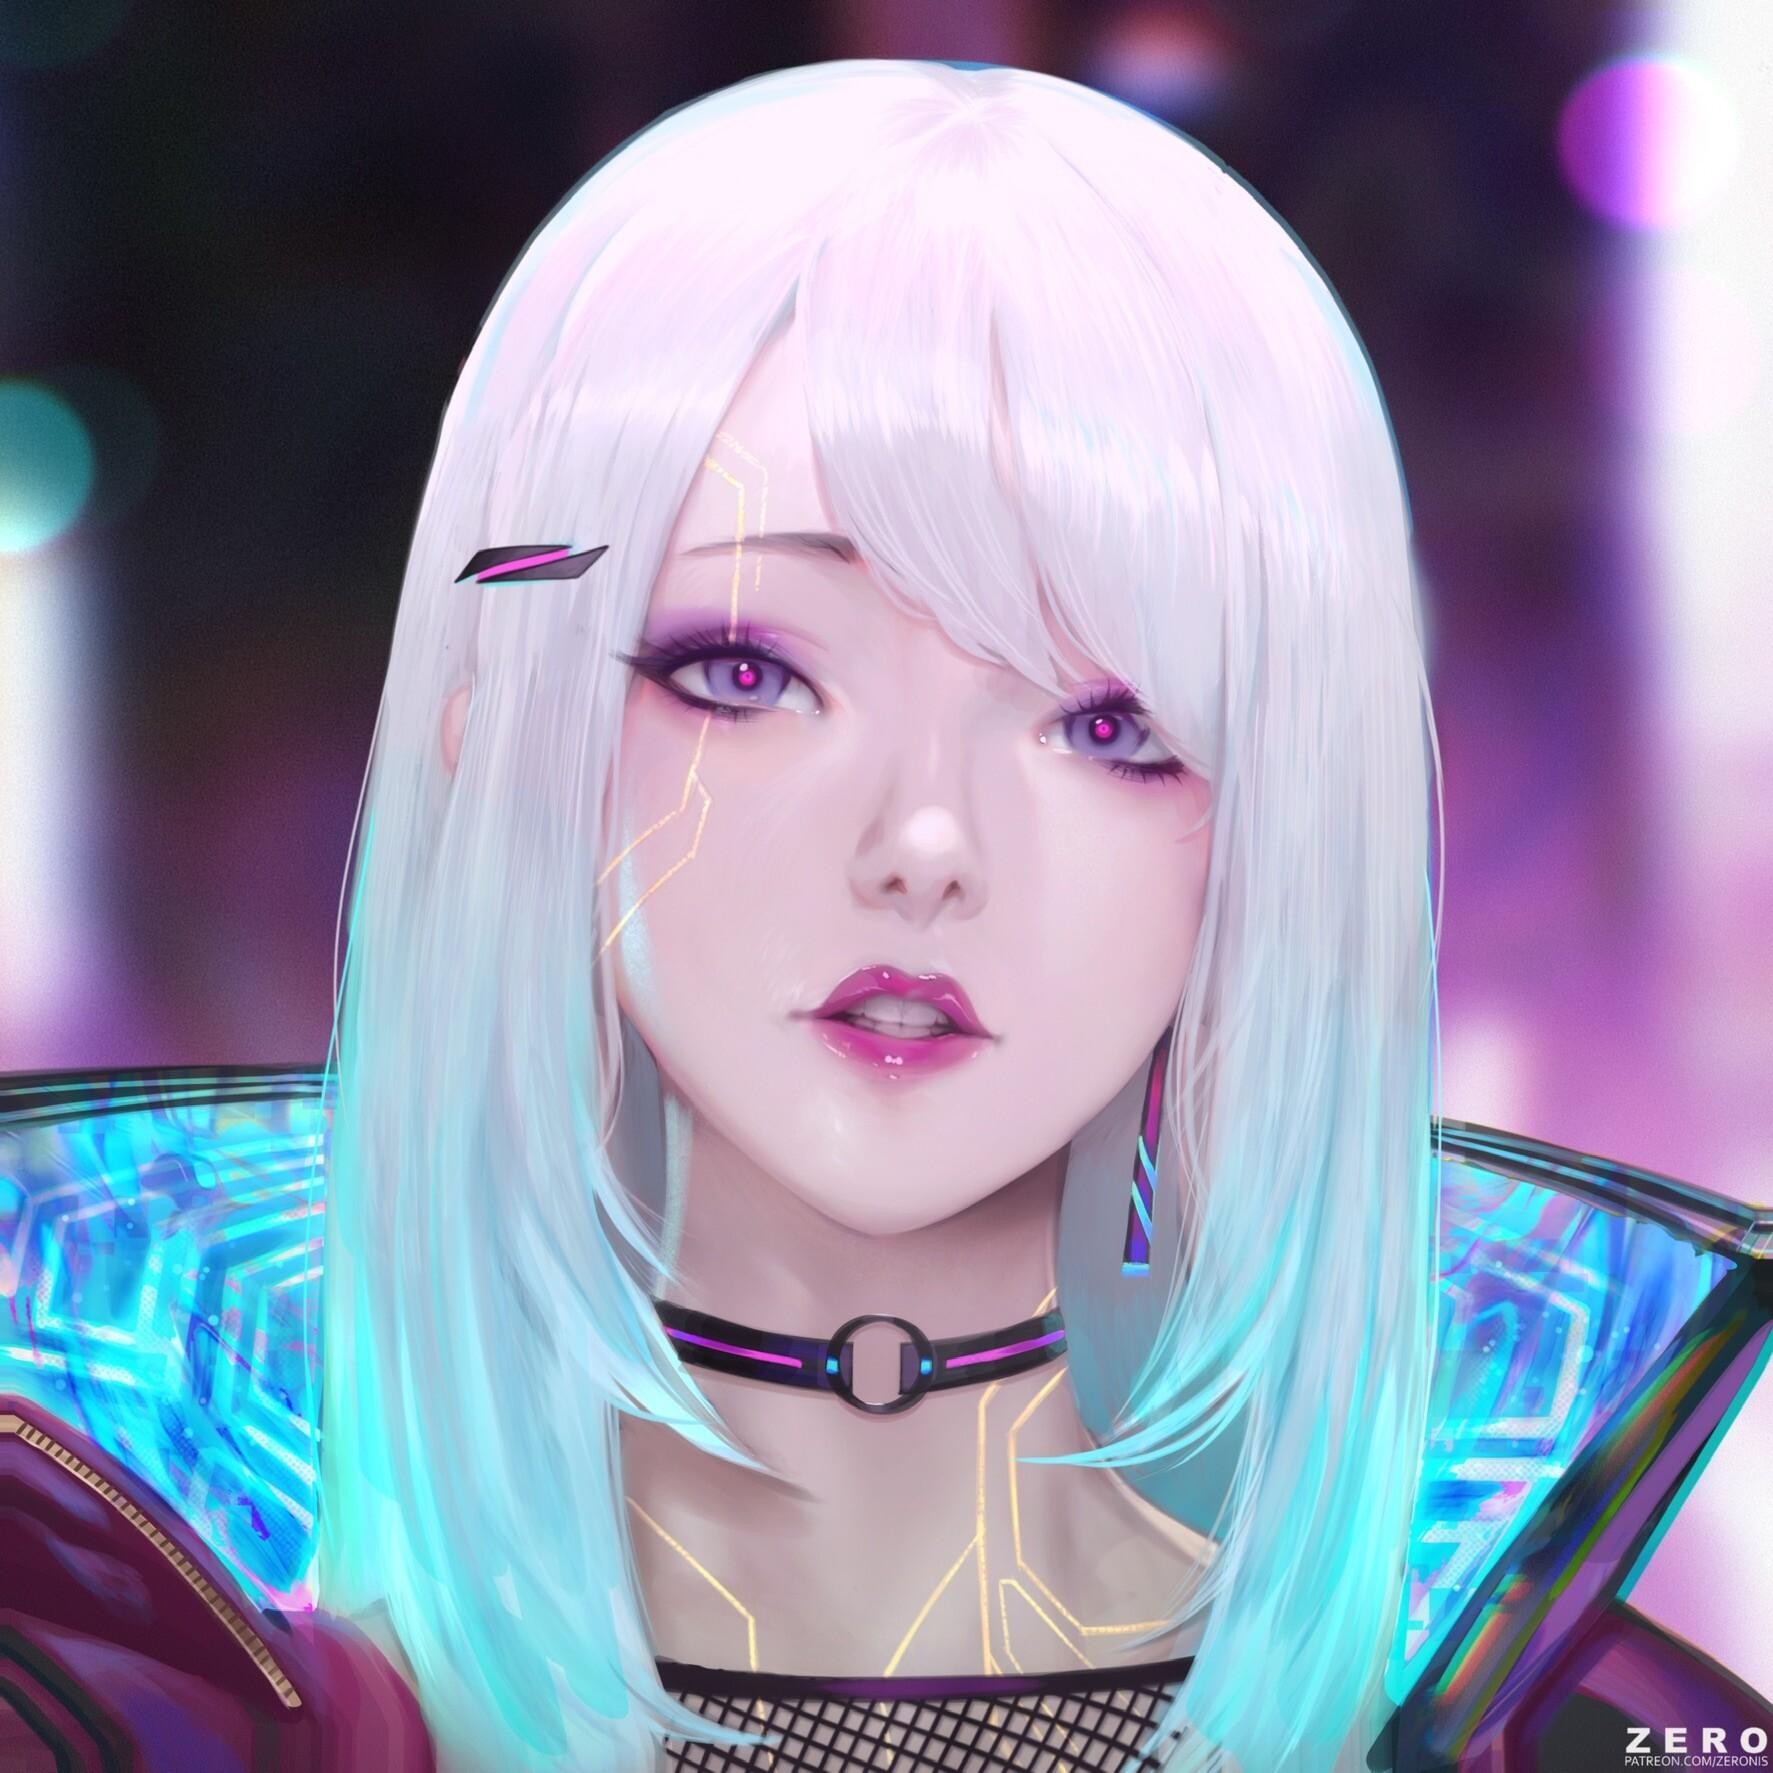 General 1773x1773 drawing women silver hair bangs purple eyes circuit lipstick makeup choker jacket neon glow lens flare cyberpunk Zeronis cyan